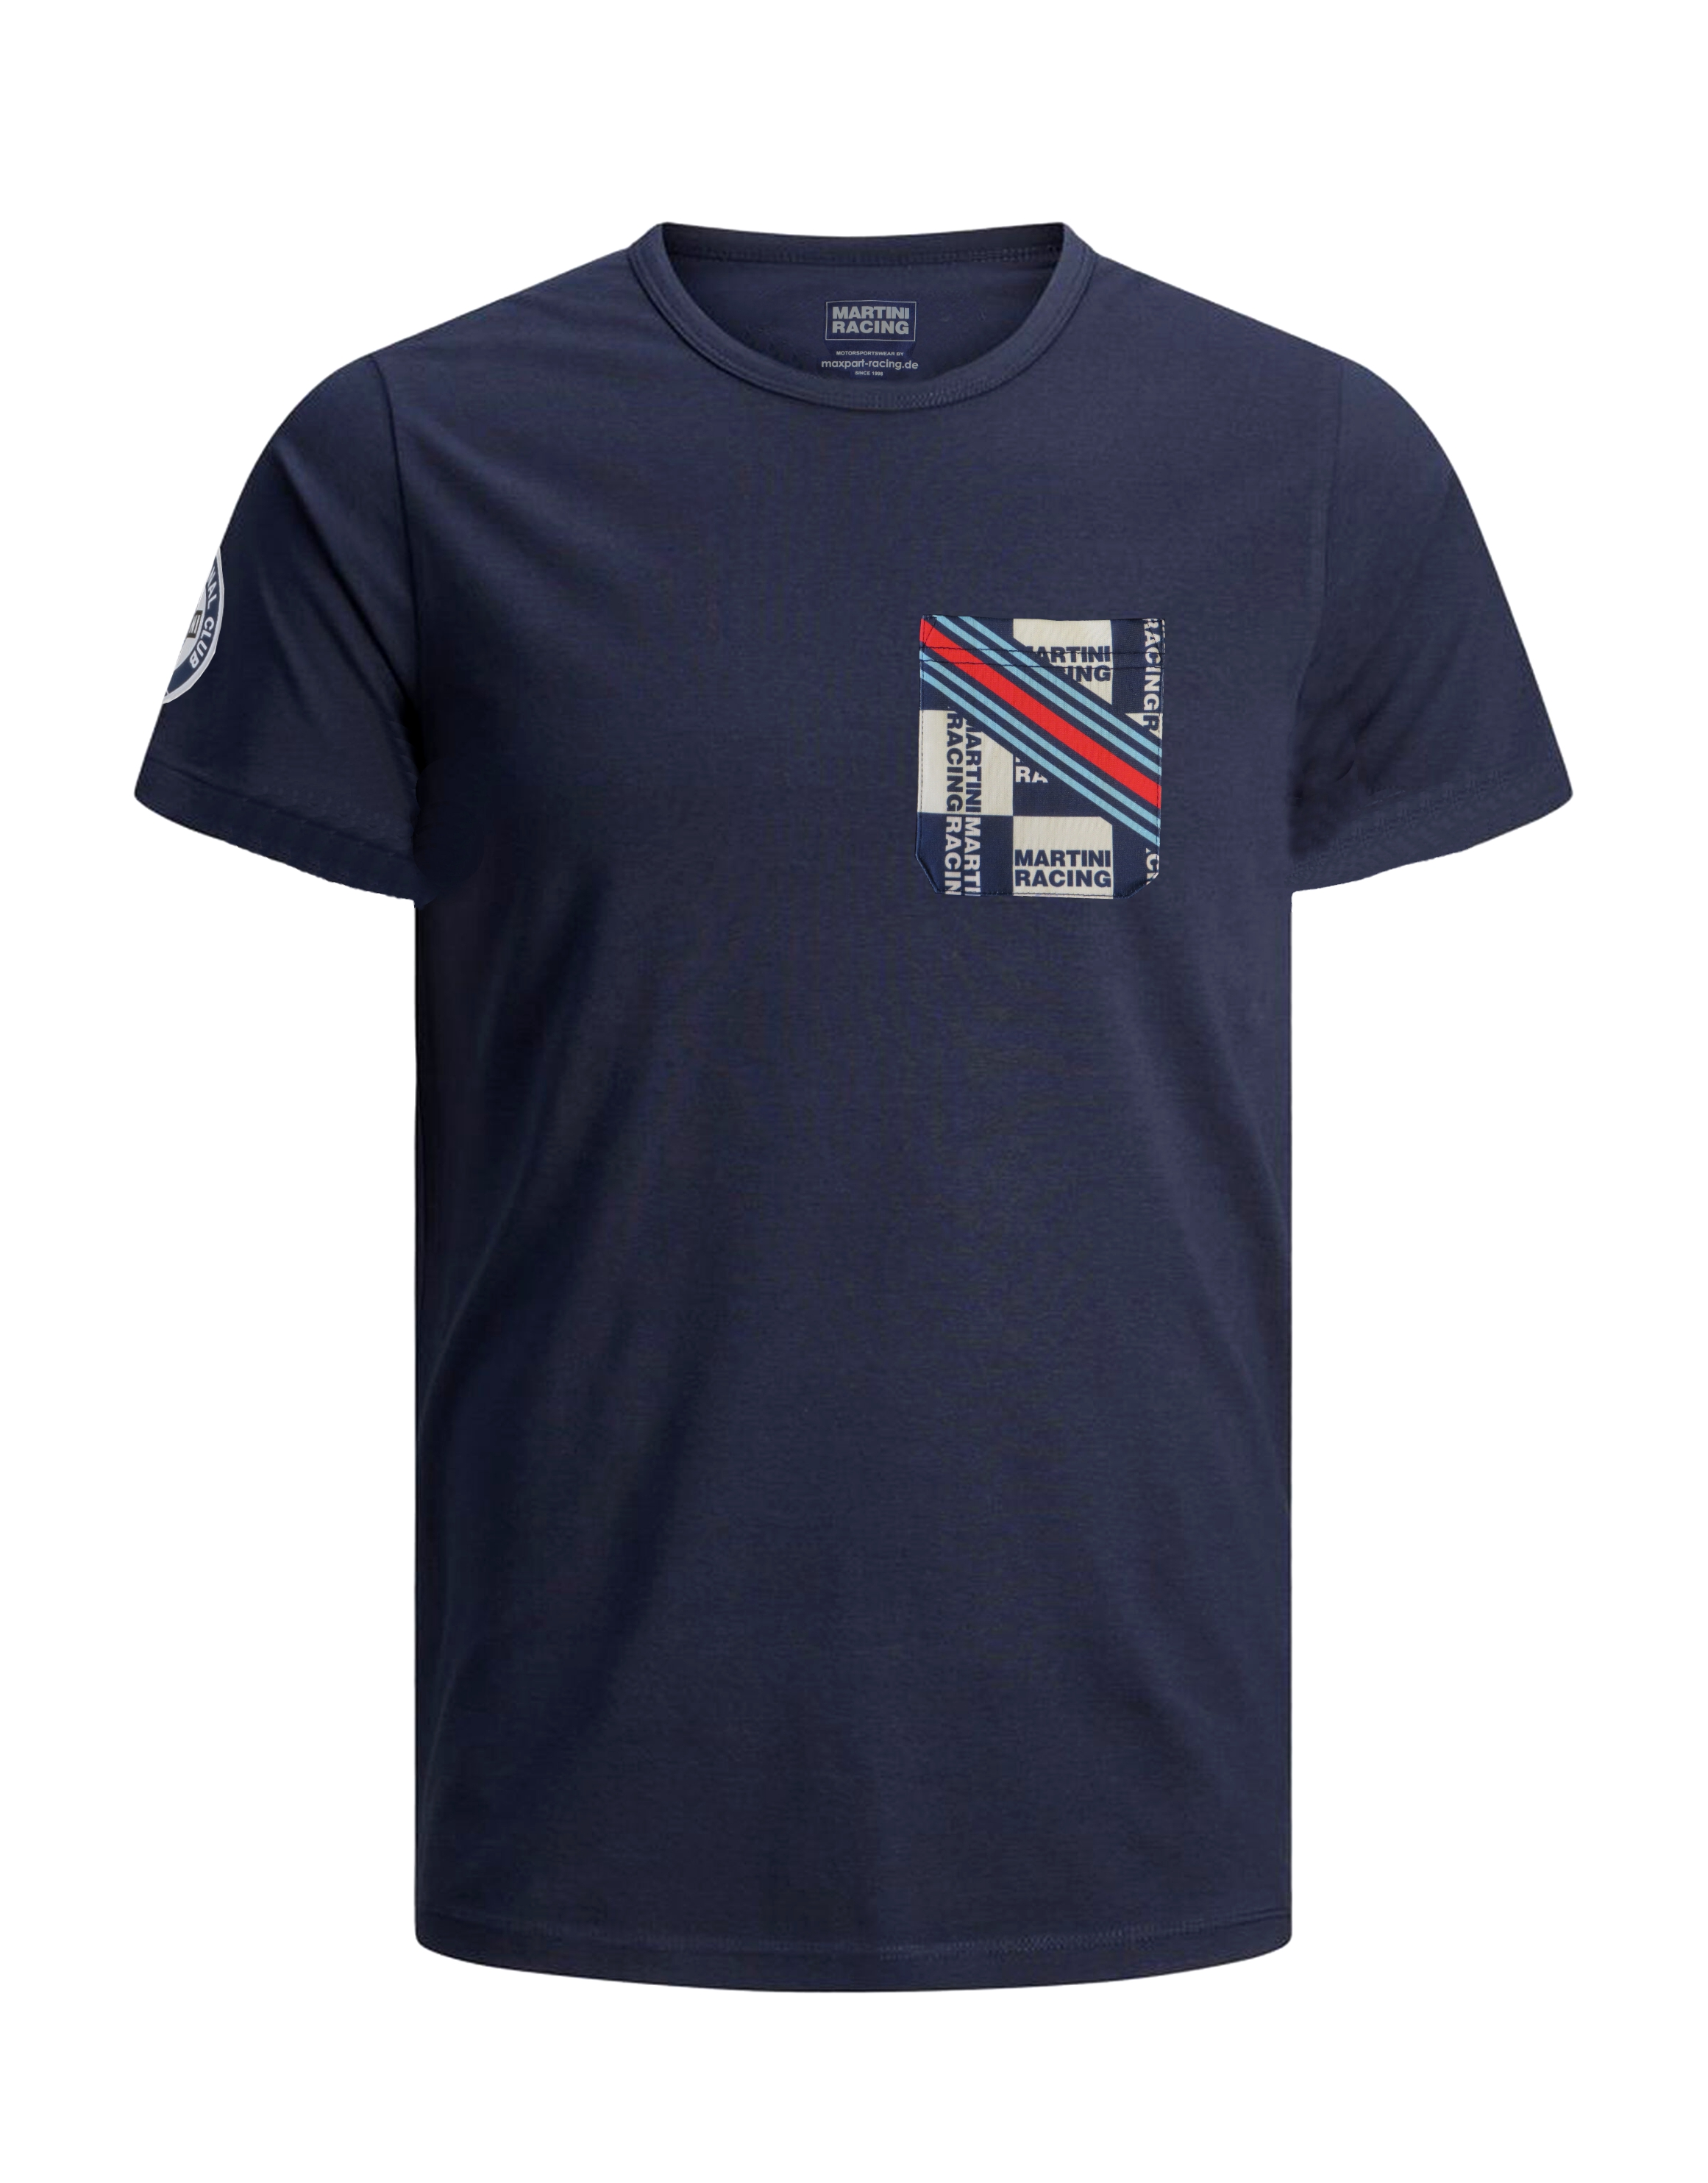 MARTINI RACING Pocket T-Shirt navy